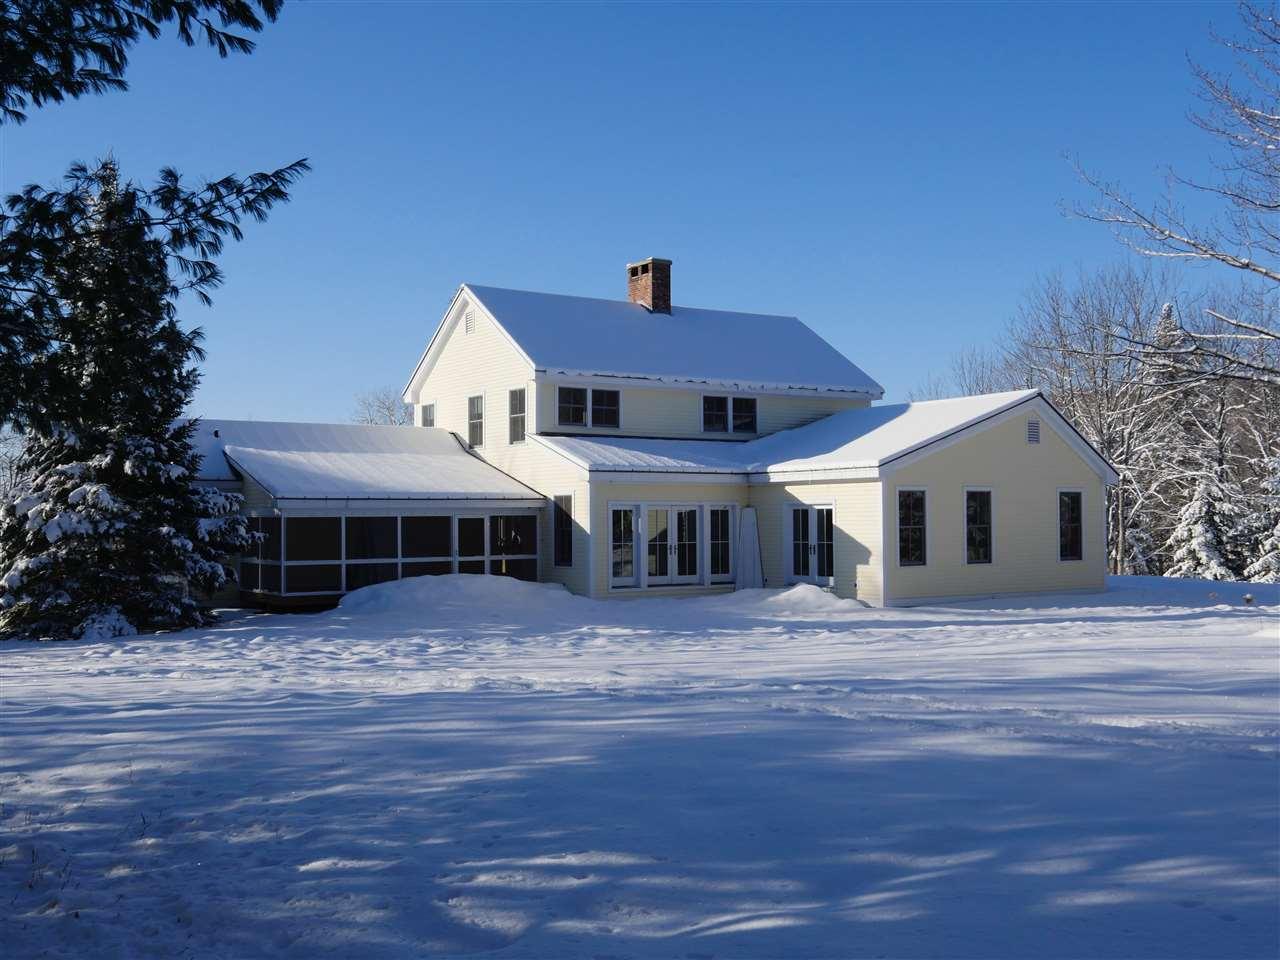 Mount-Snow-Real-Estate-4517321-4